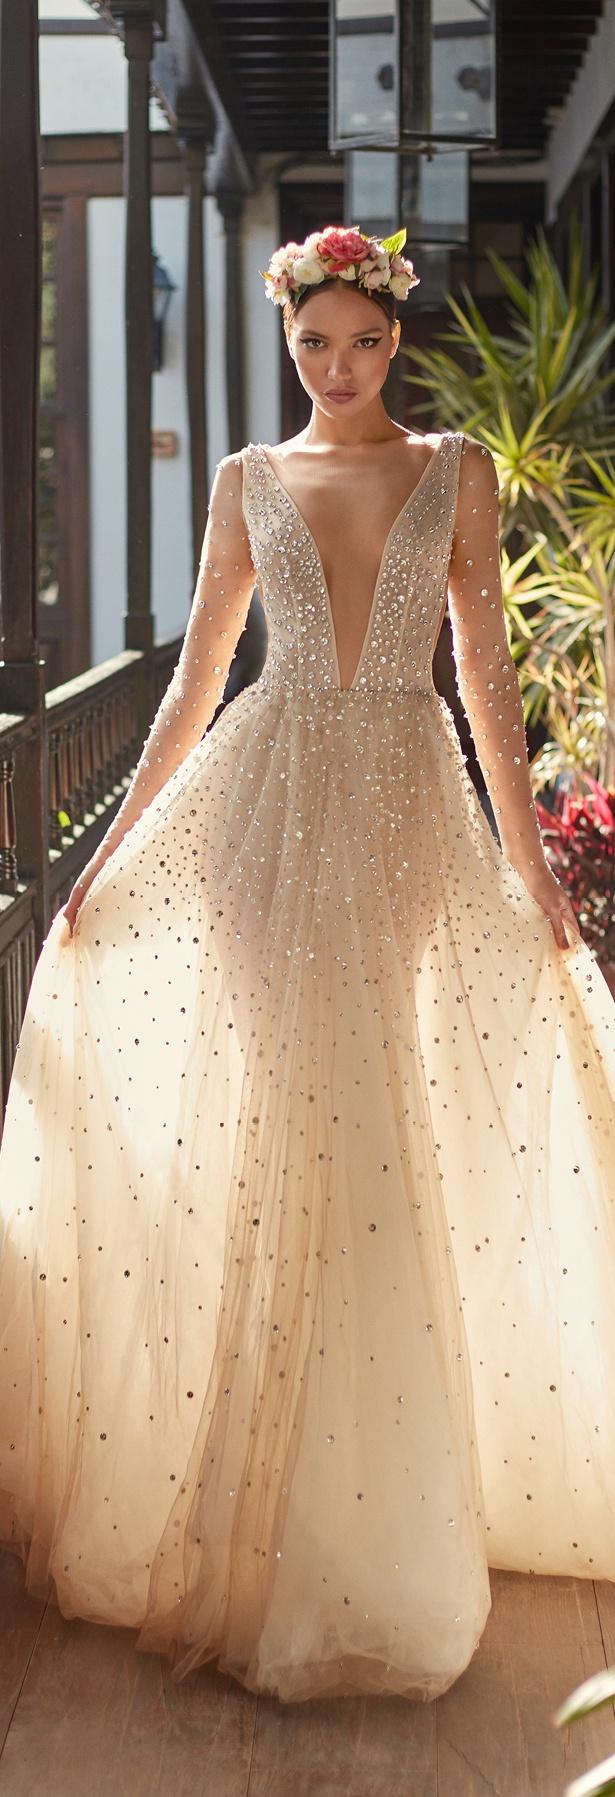 Galia Lahav Couture Bridal Amaya Wedding Dress